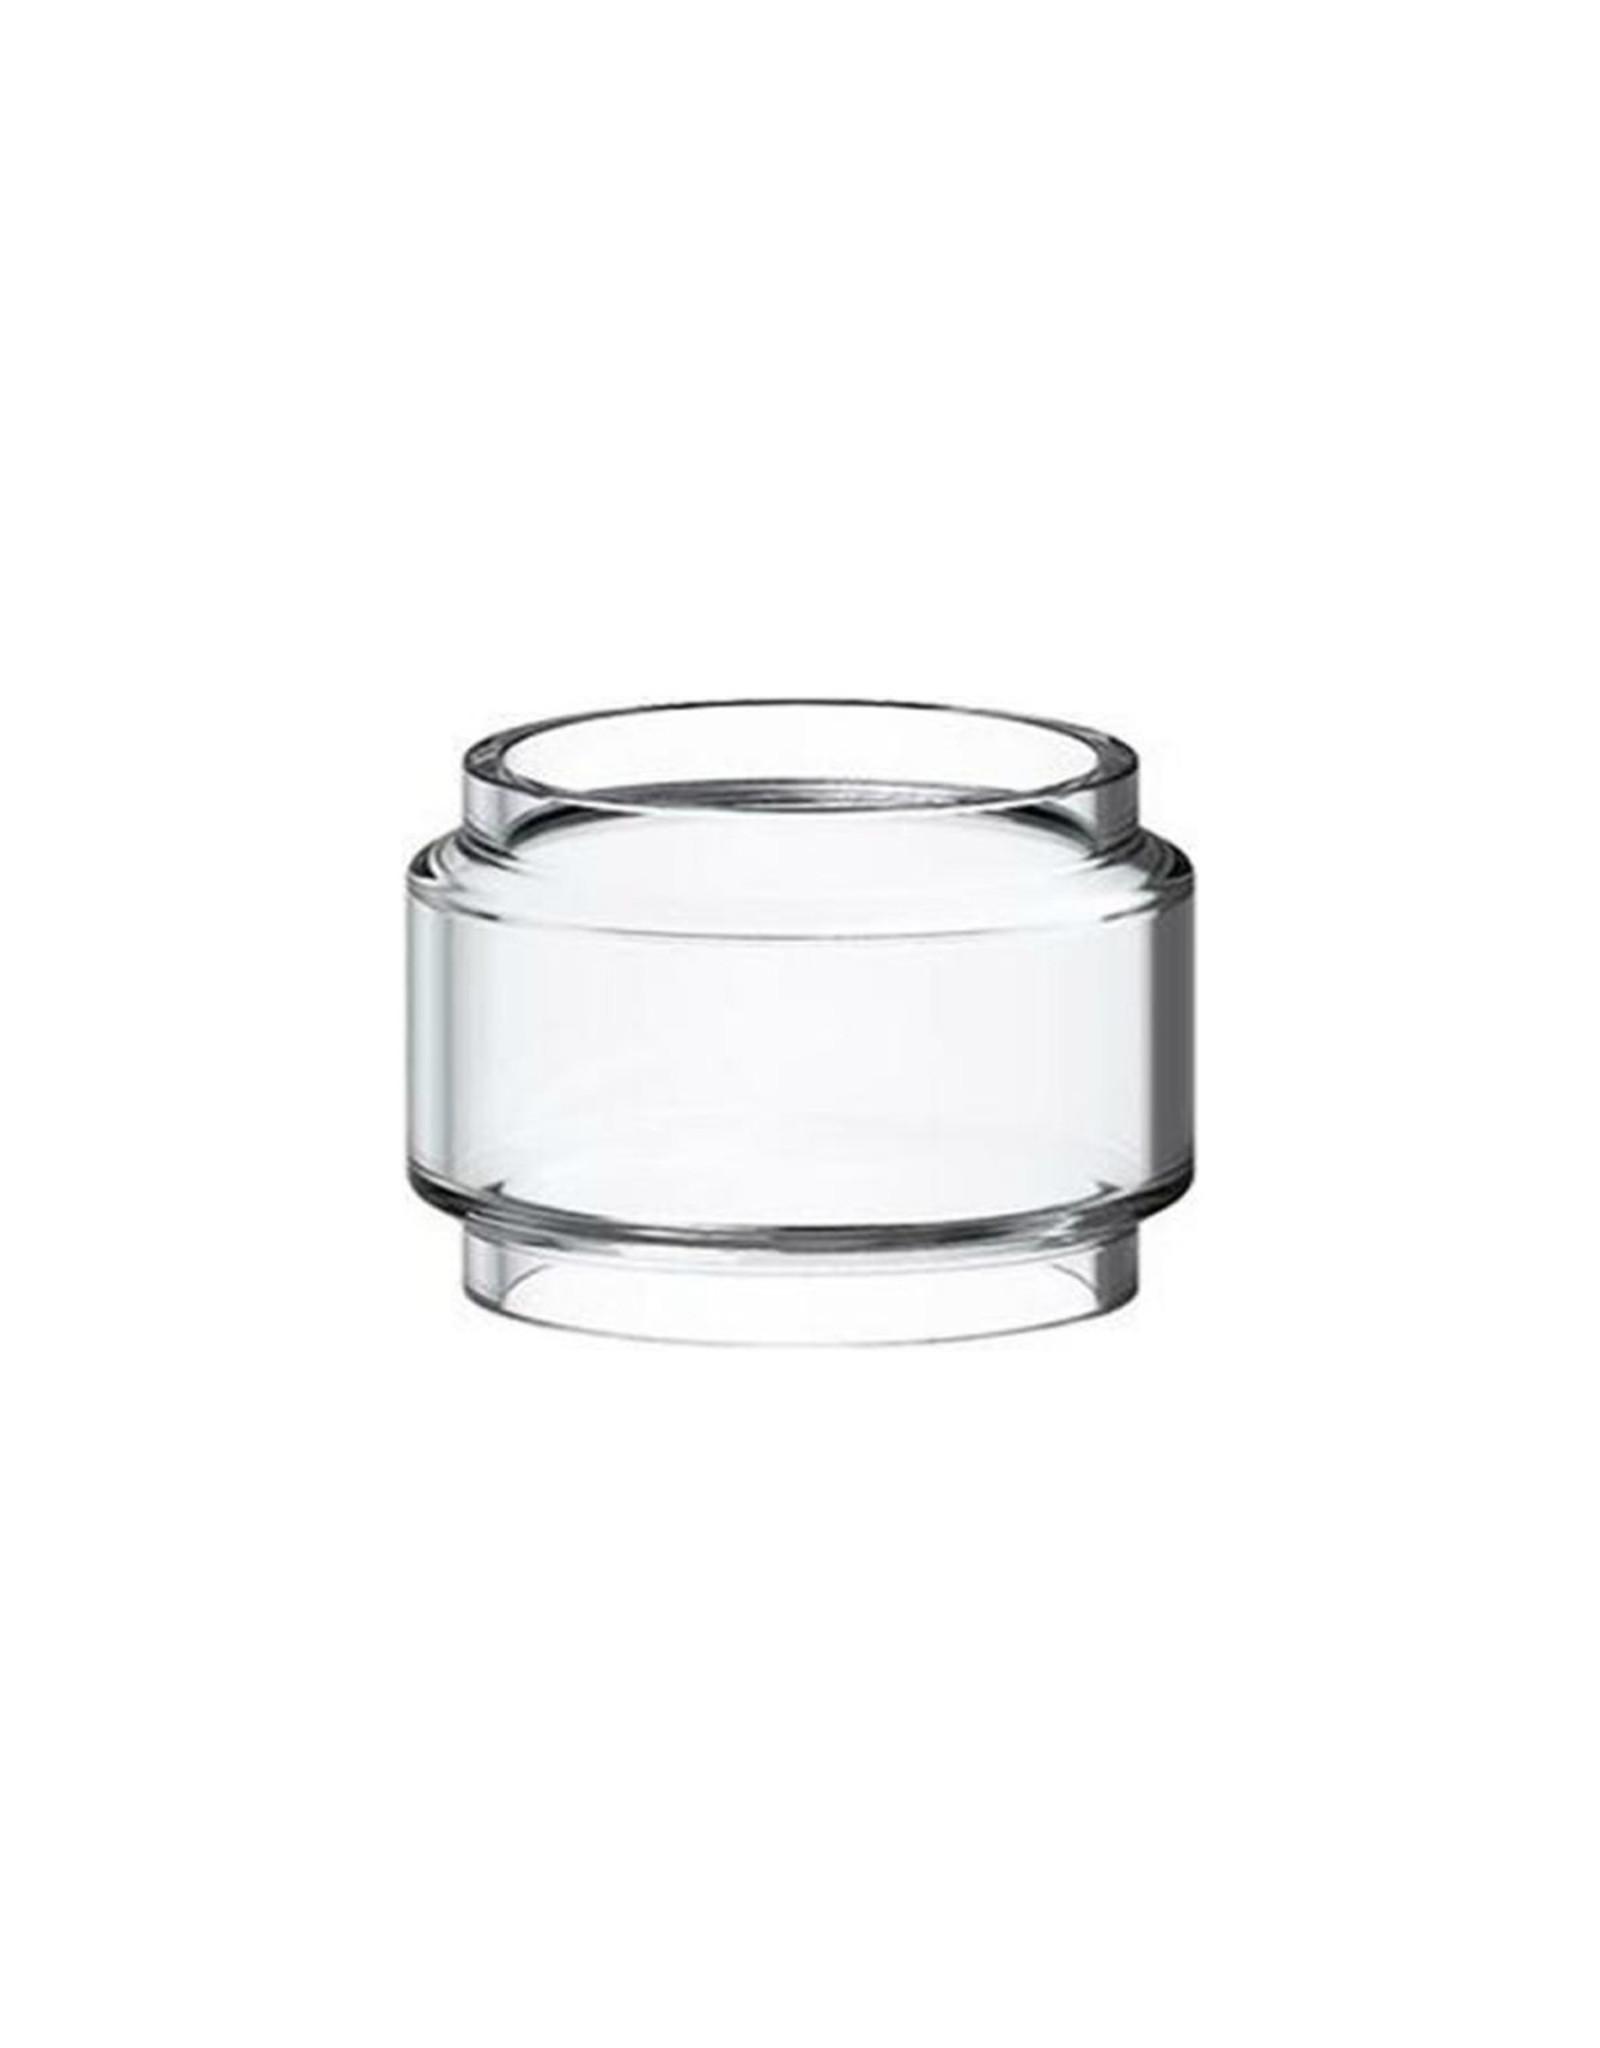 Vaporesso Sky Solo Replacement Bubble Glass 3.5ml